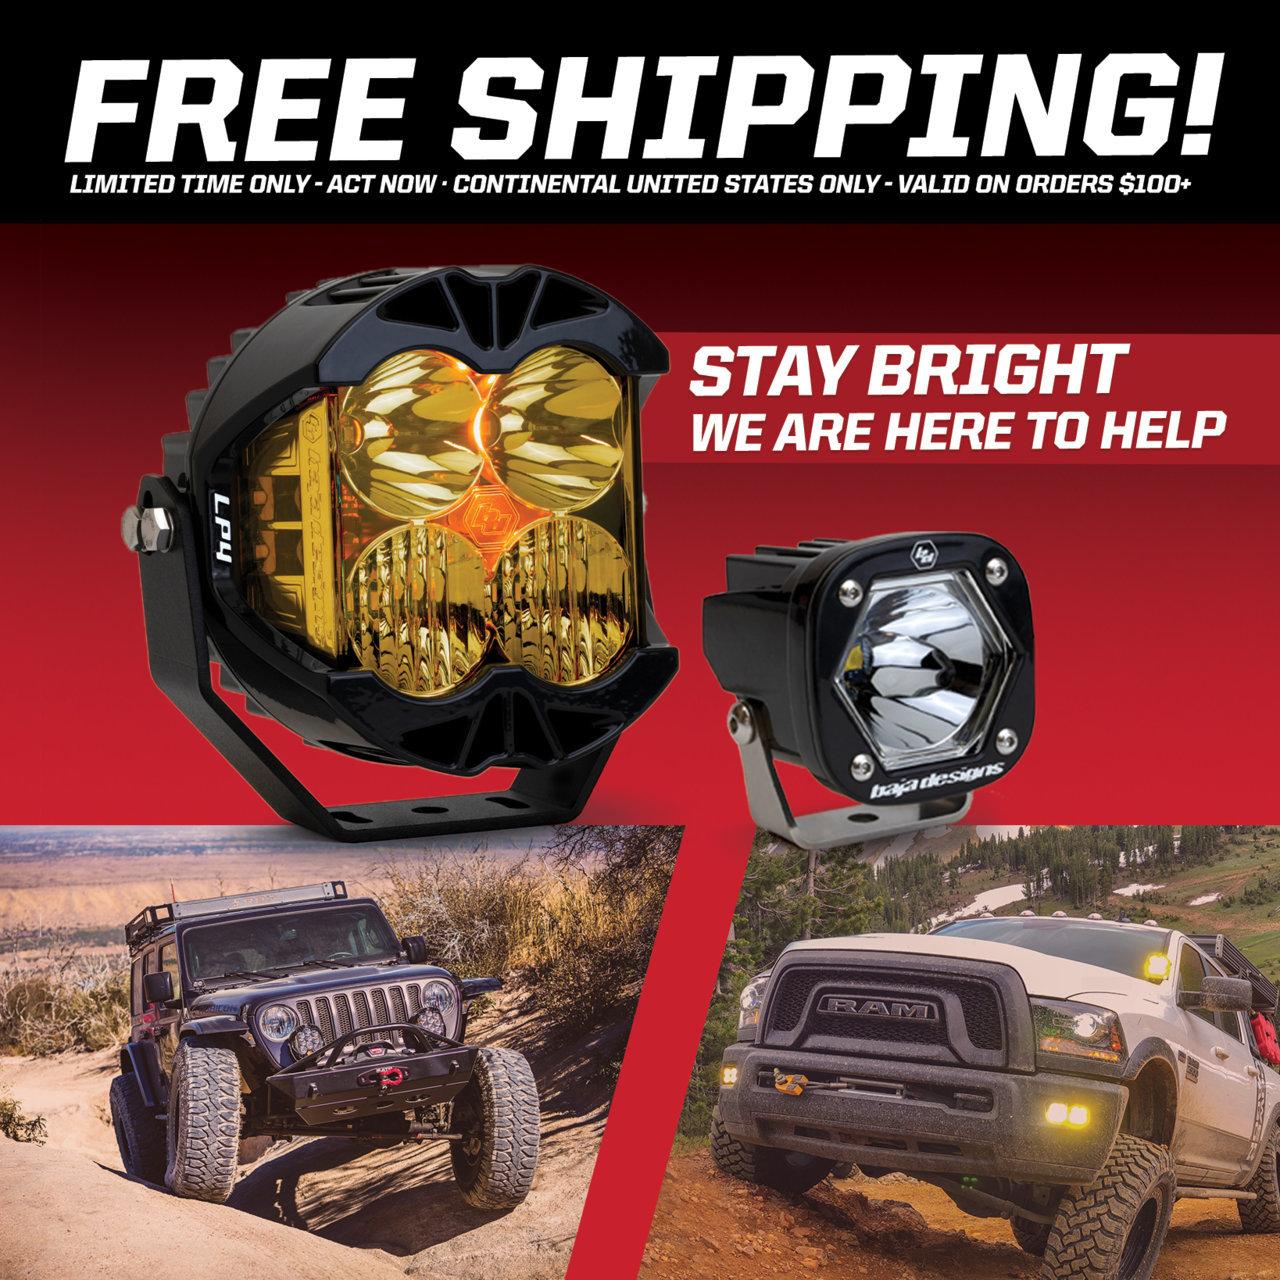 BD-Free-Shipping.jpg